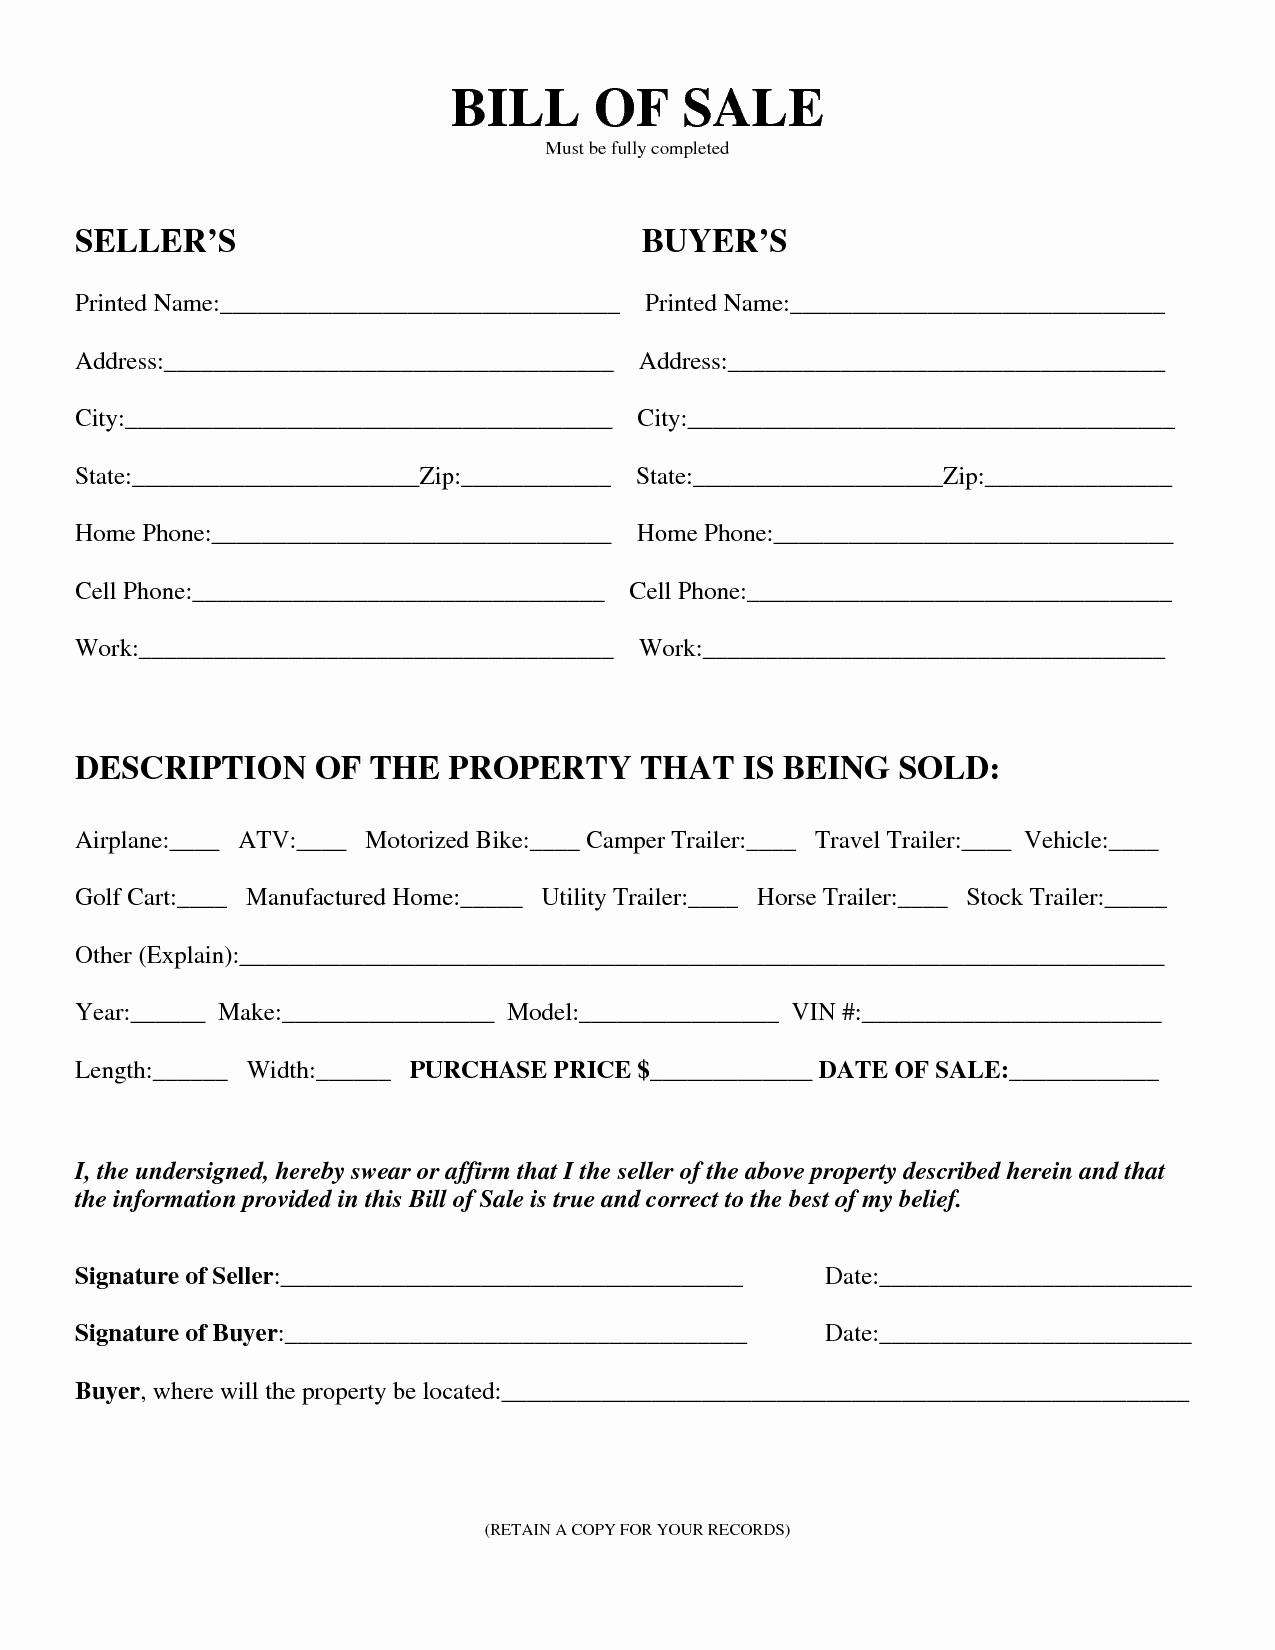 Auto Bill Of Sale Template New Download Bill Sale forms Pdf Templates